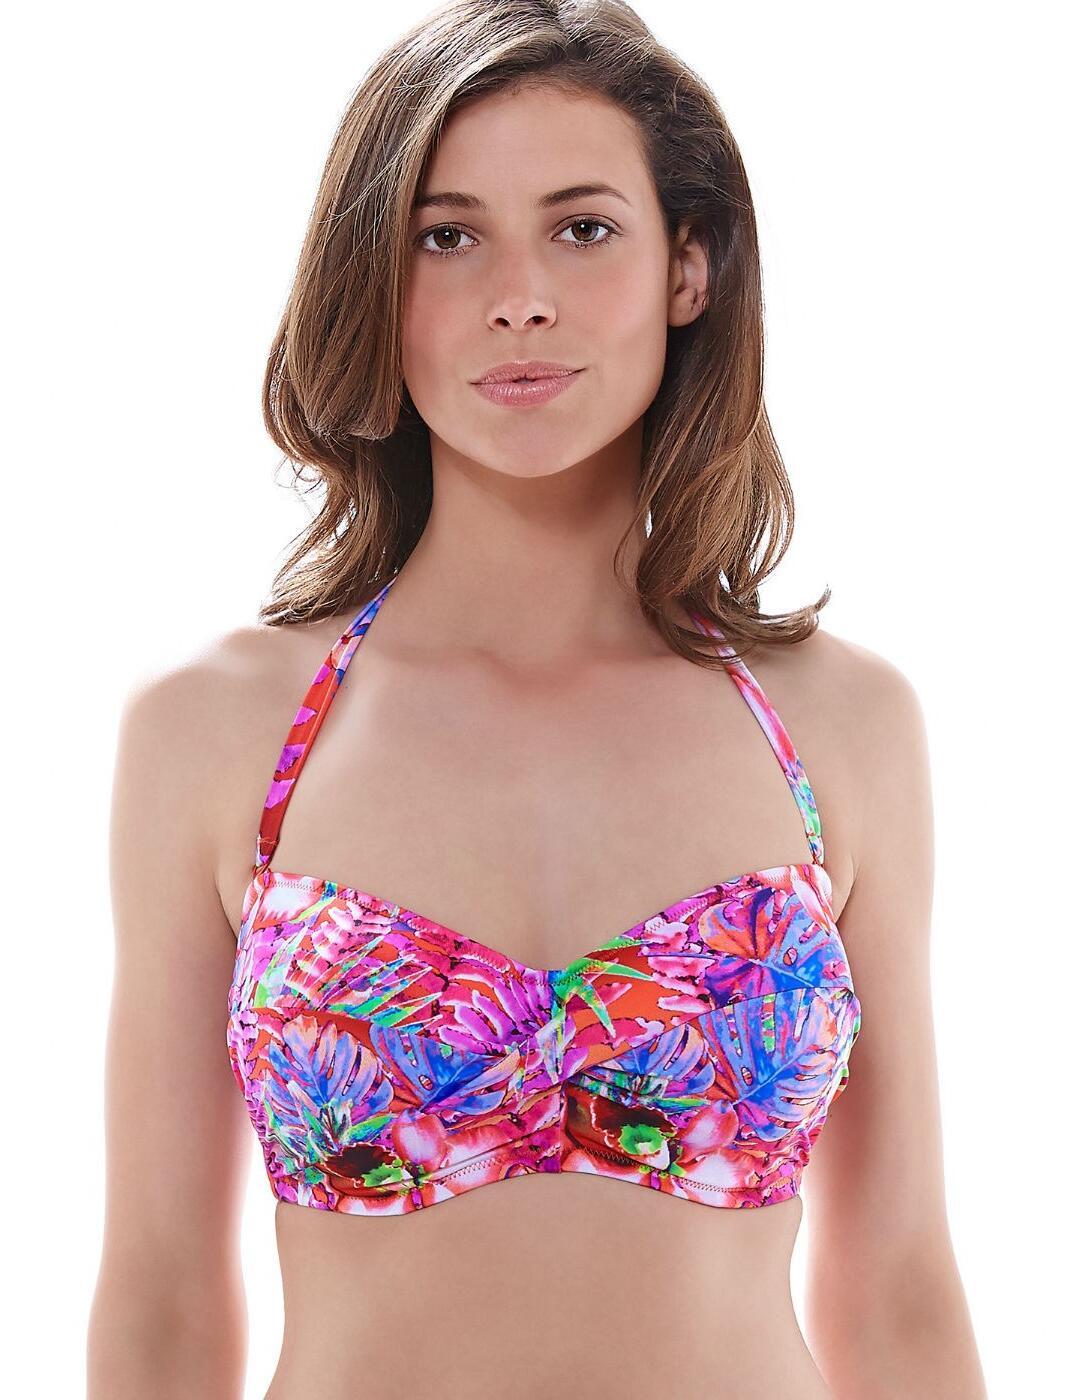 6171 Fantasie Punta Cana Twist Bandeau Bikini Top Hot Coral - 6171 Bandeau Top